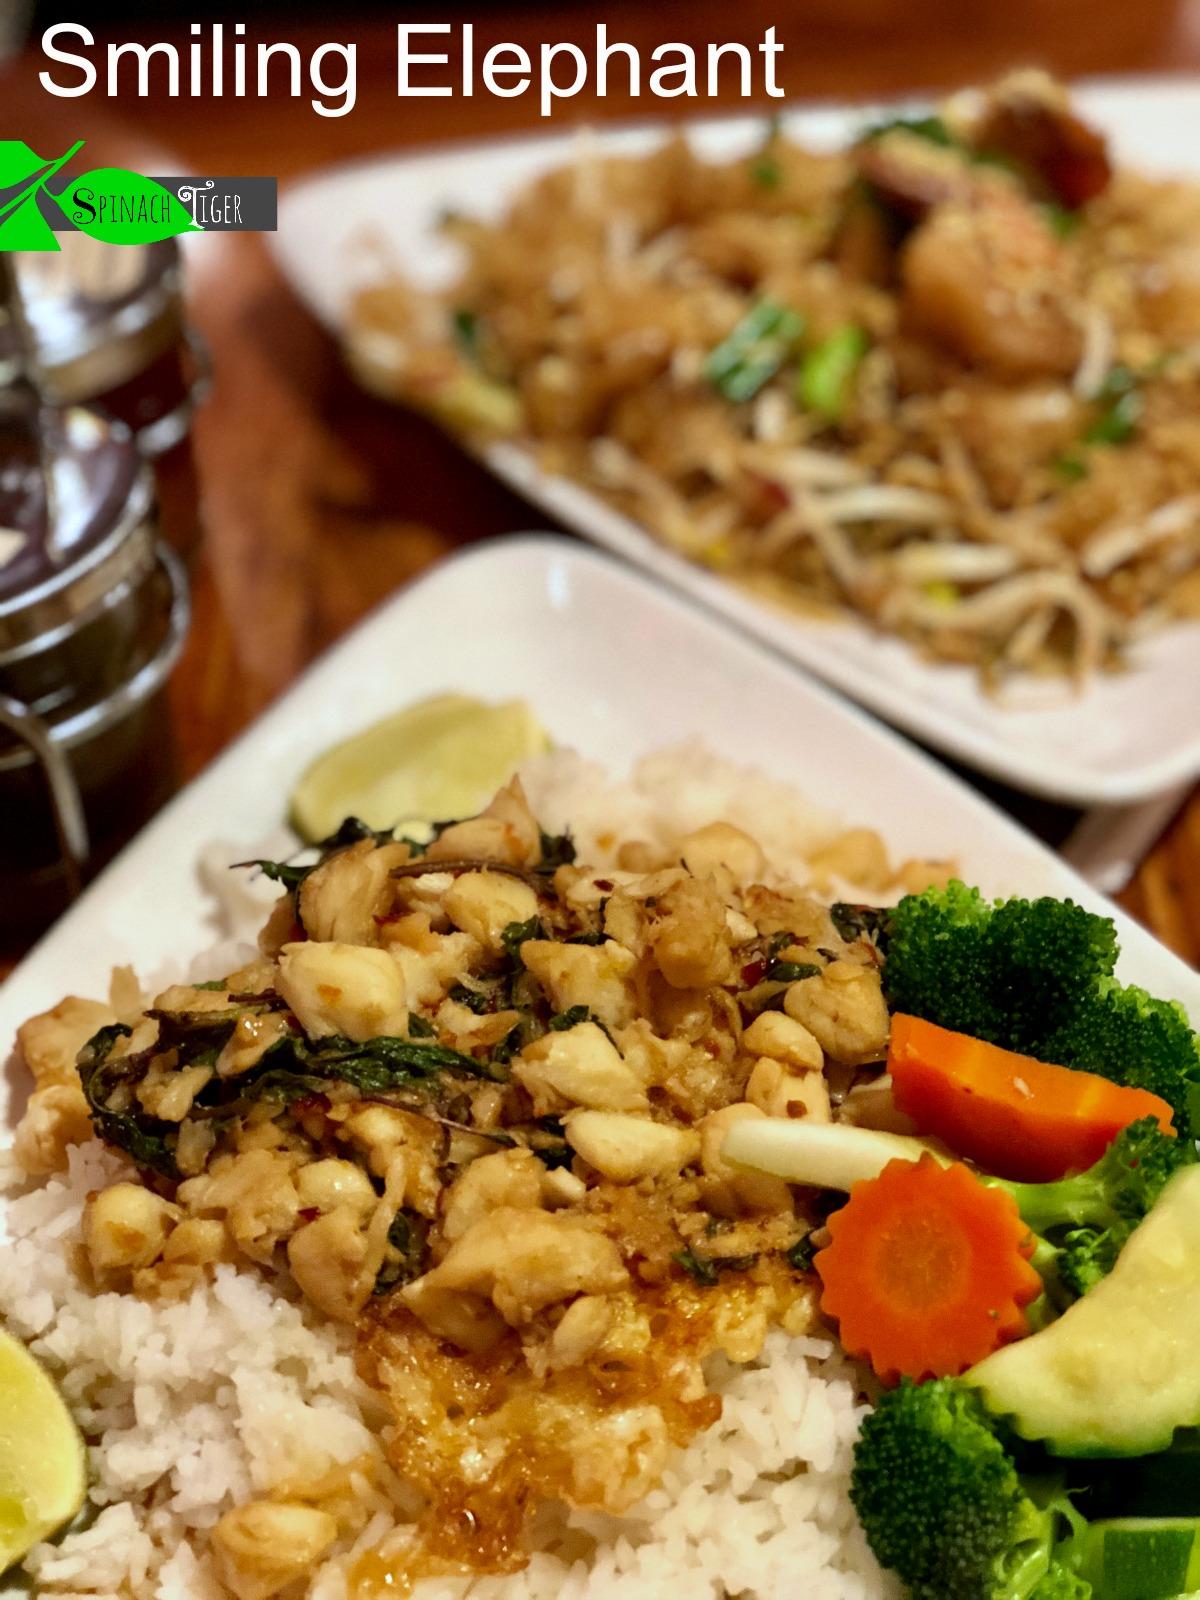 Nashville Restaurants: Smiling Elephant, Our Favorite Thai